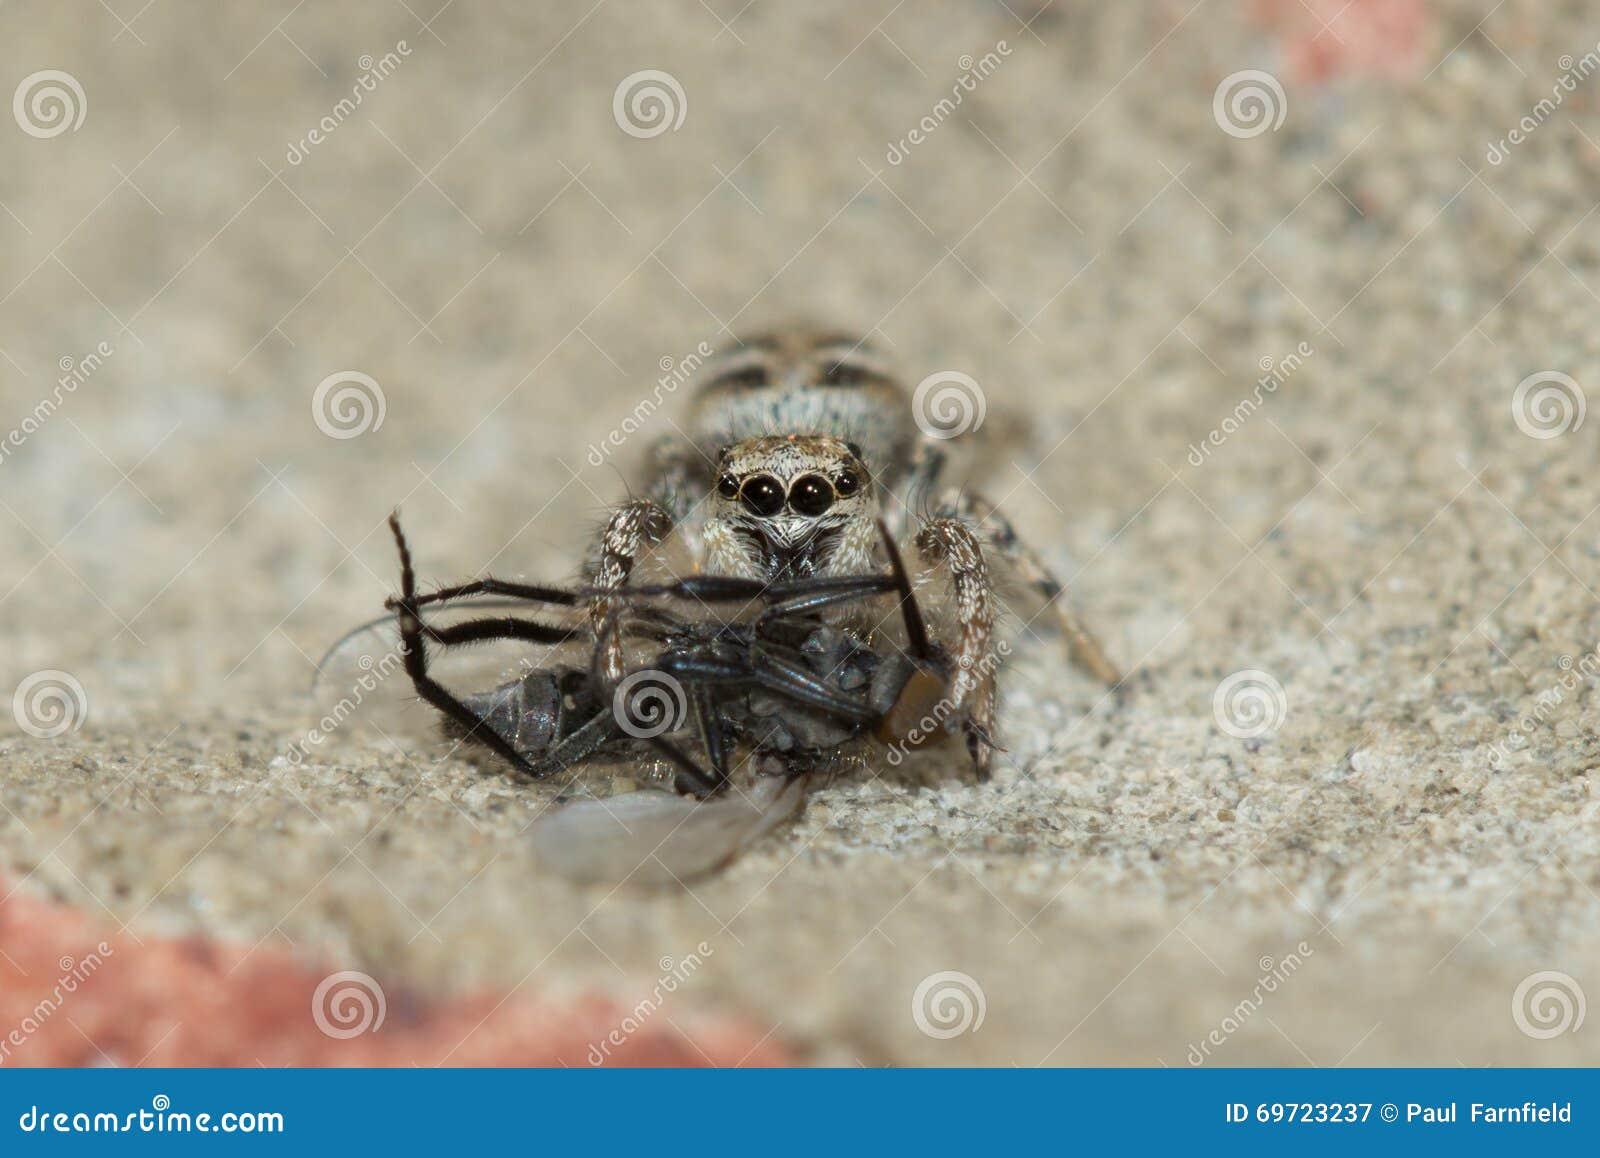 Паук зебры (scenicus Salticus) с добычей